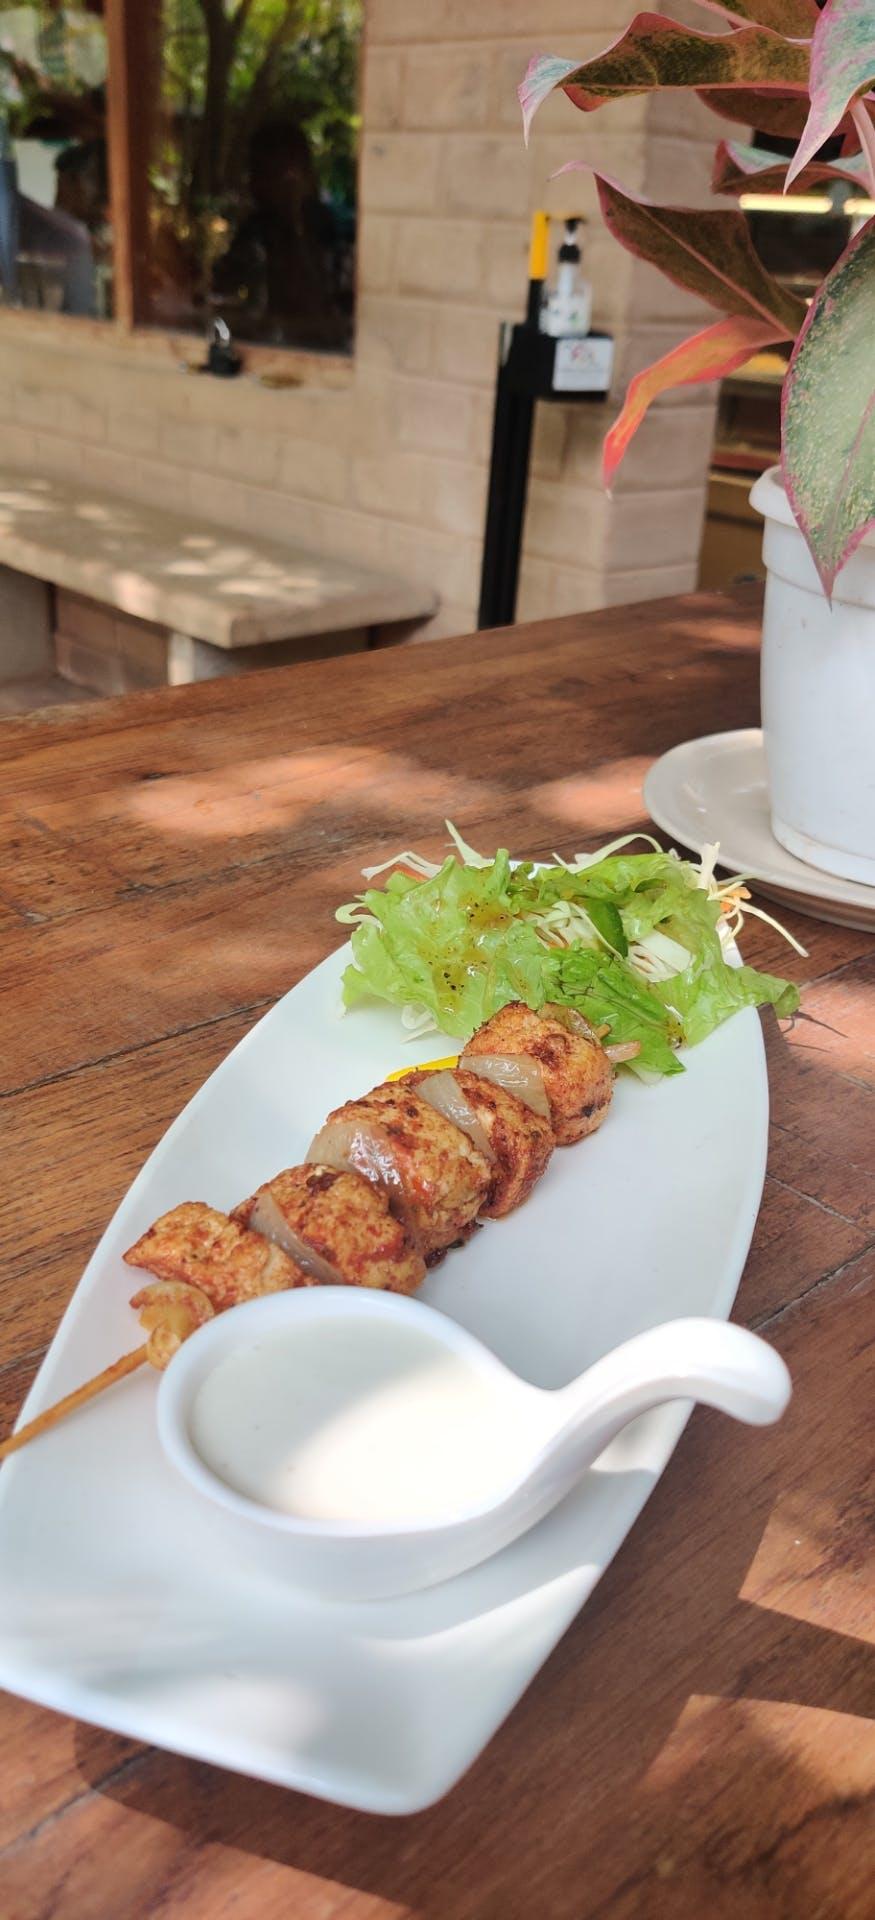 Dish,Food,Cuisine,Ingredient,Satay,Kebab,Brochette,Shashlik,Souvlaki,Produce